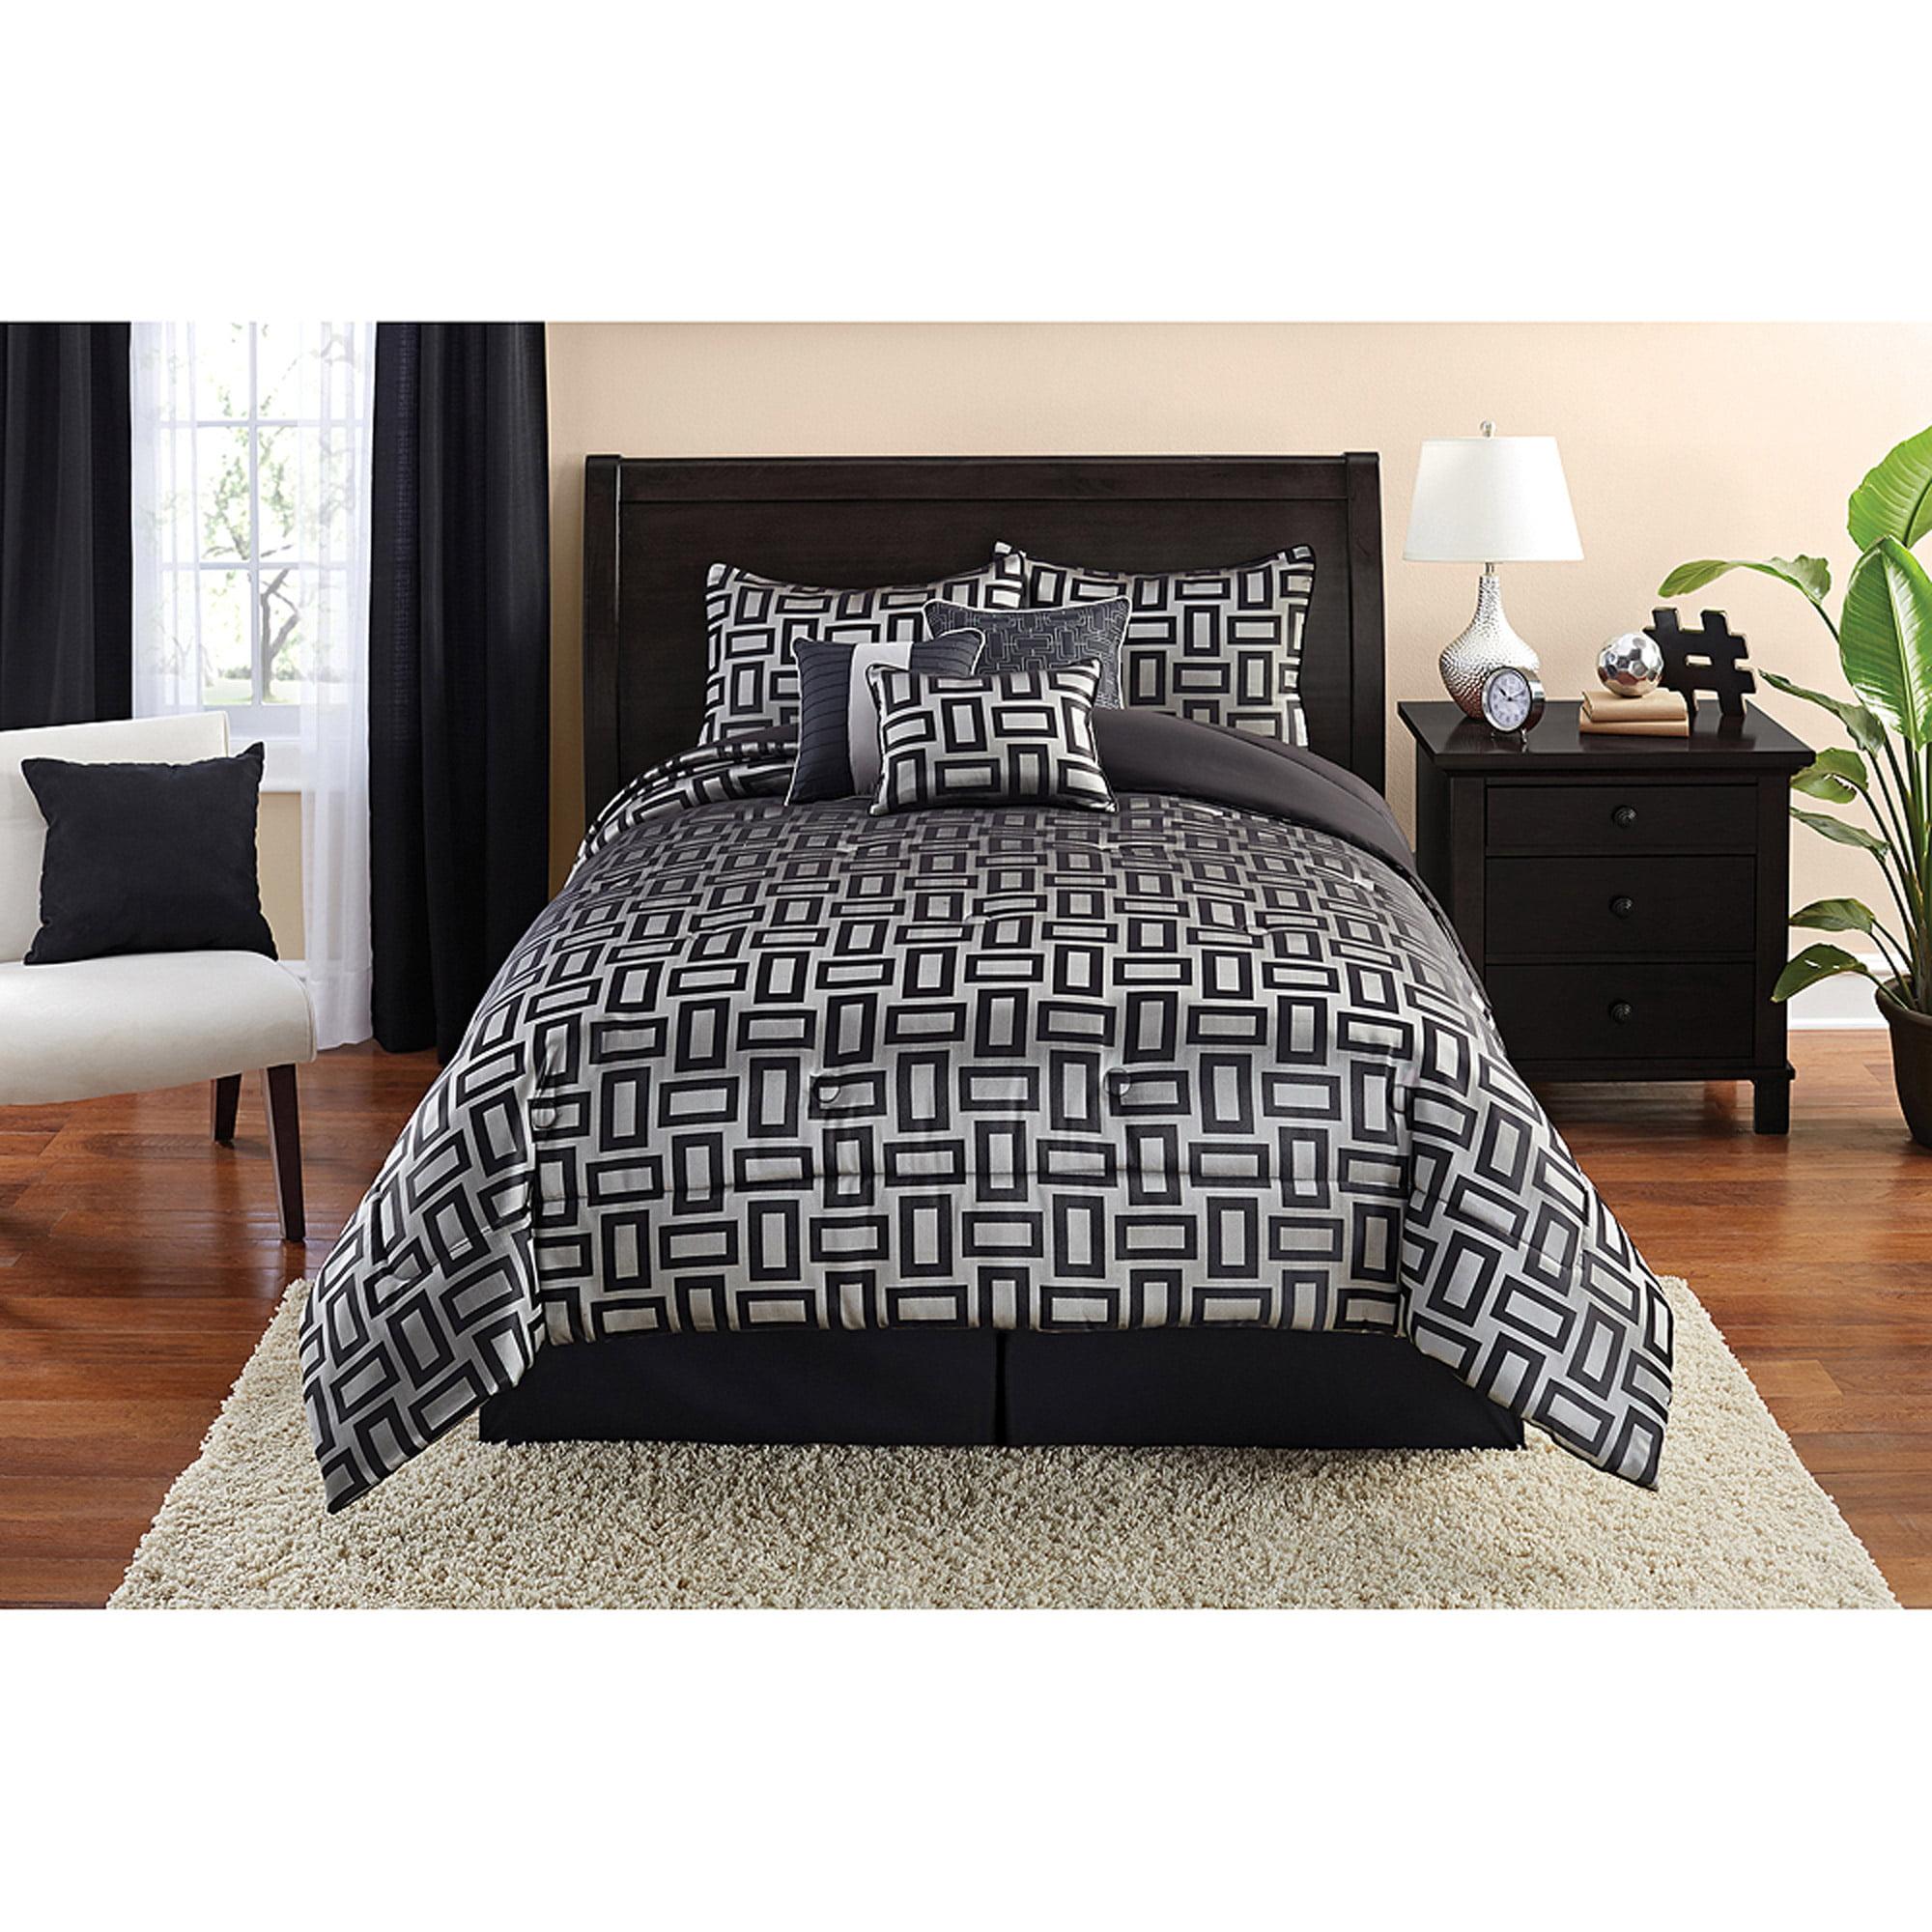 Mainstays King Geometric Comforter Set, 7 Piece